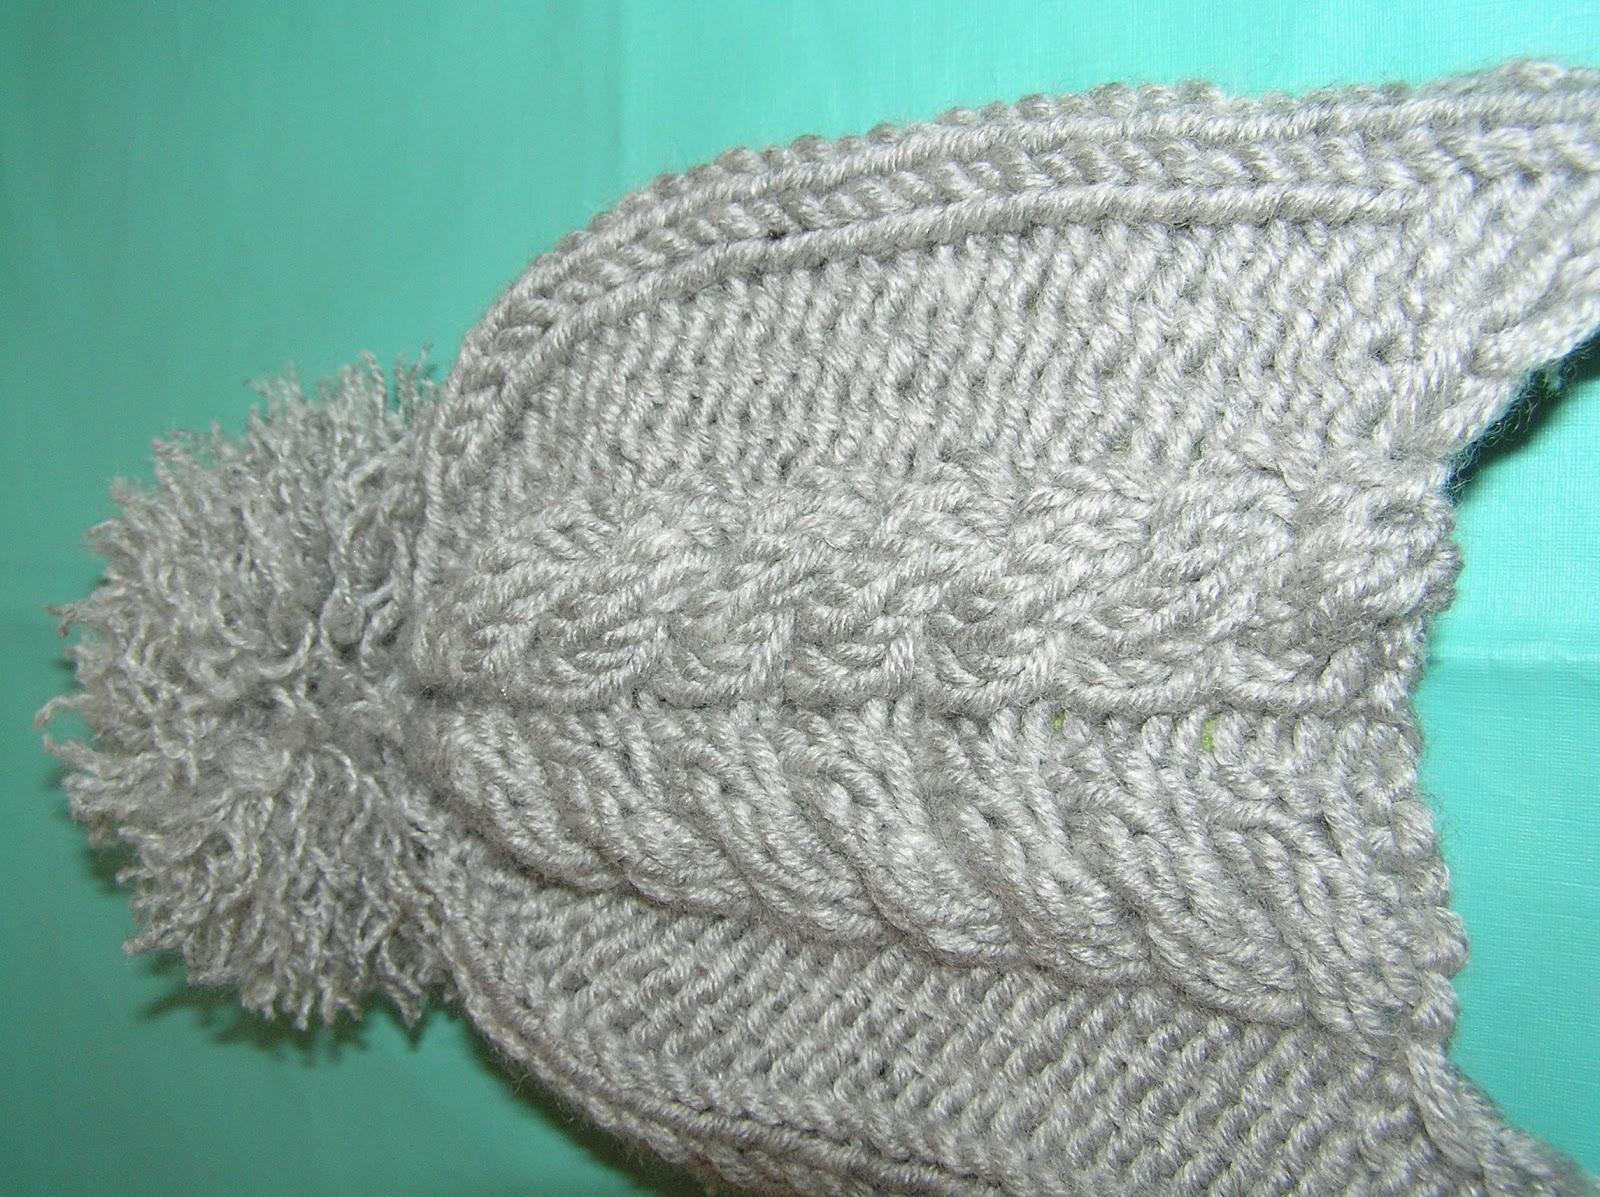 Вязание волн спицами с описанием